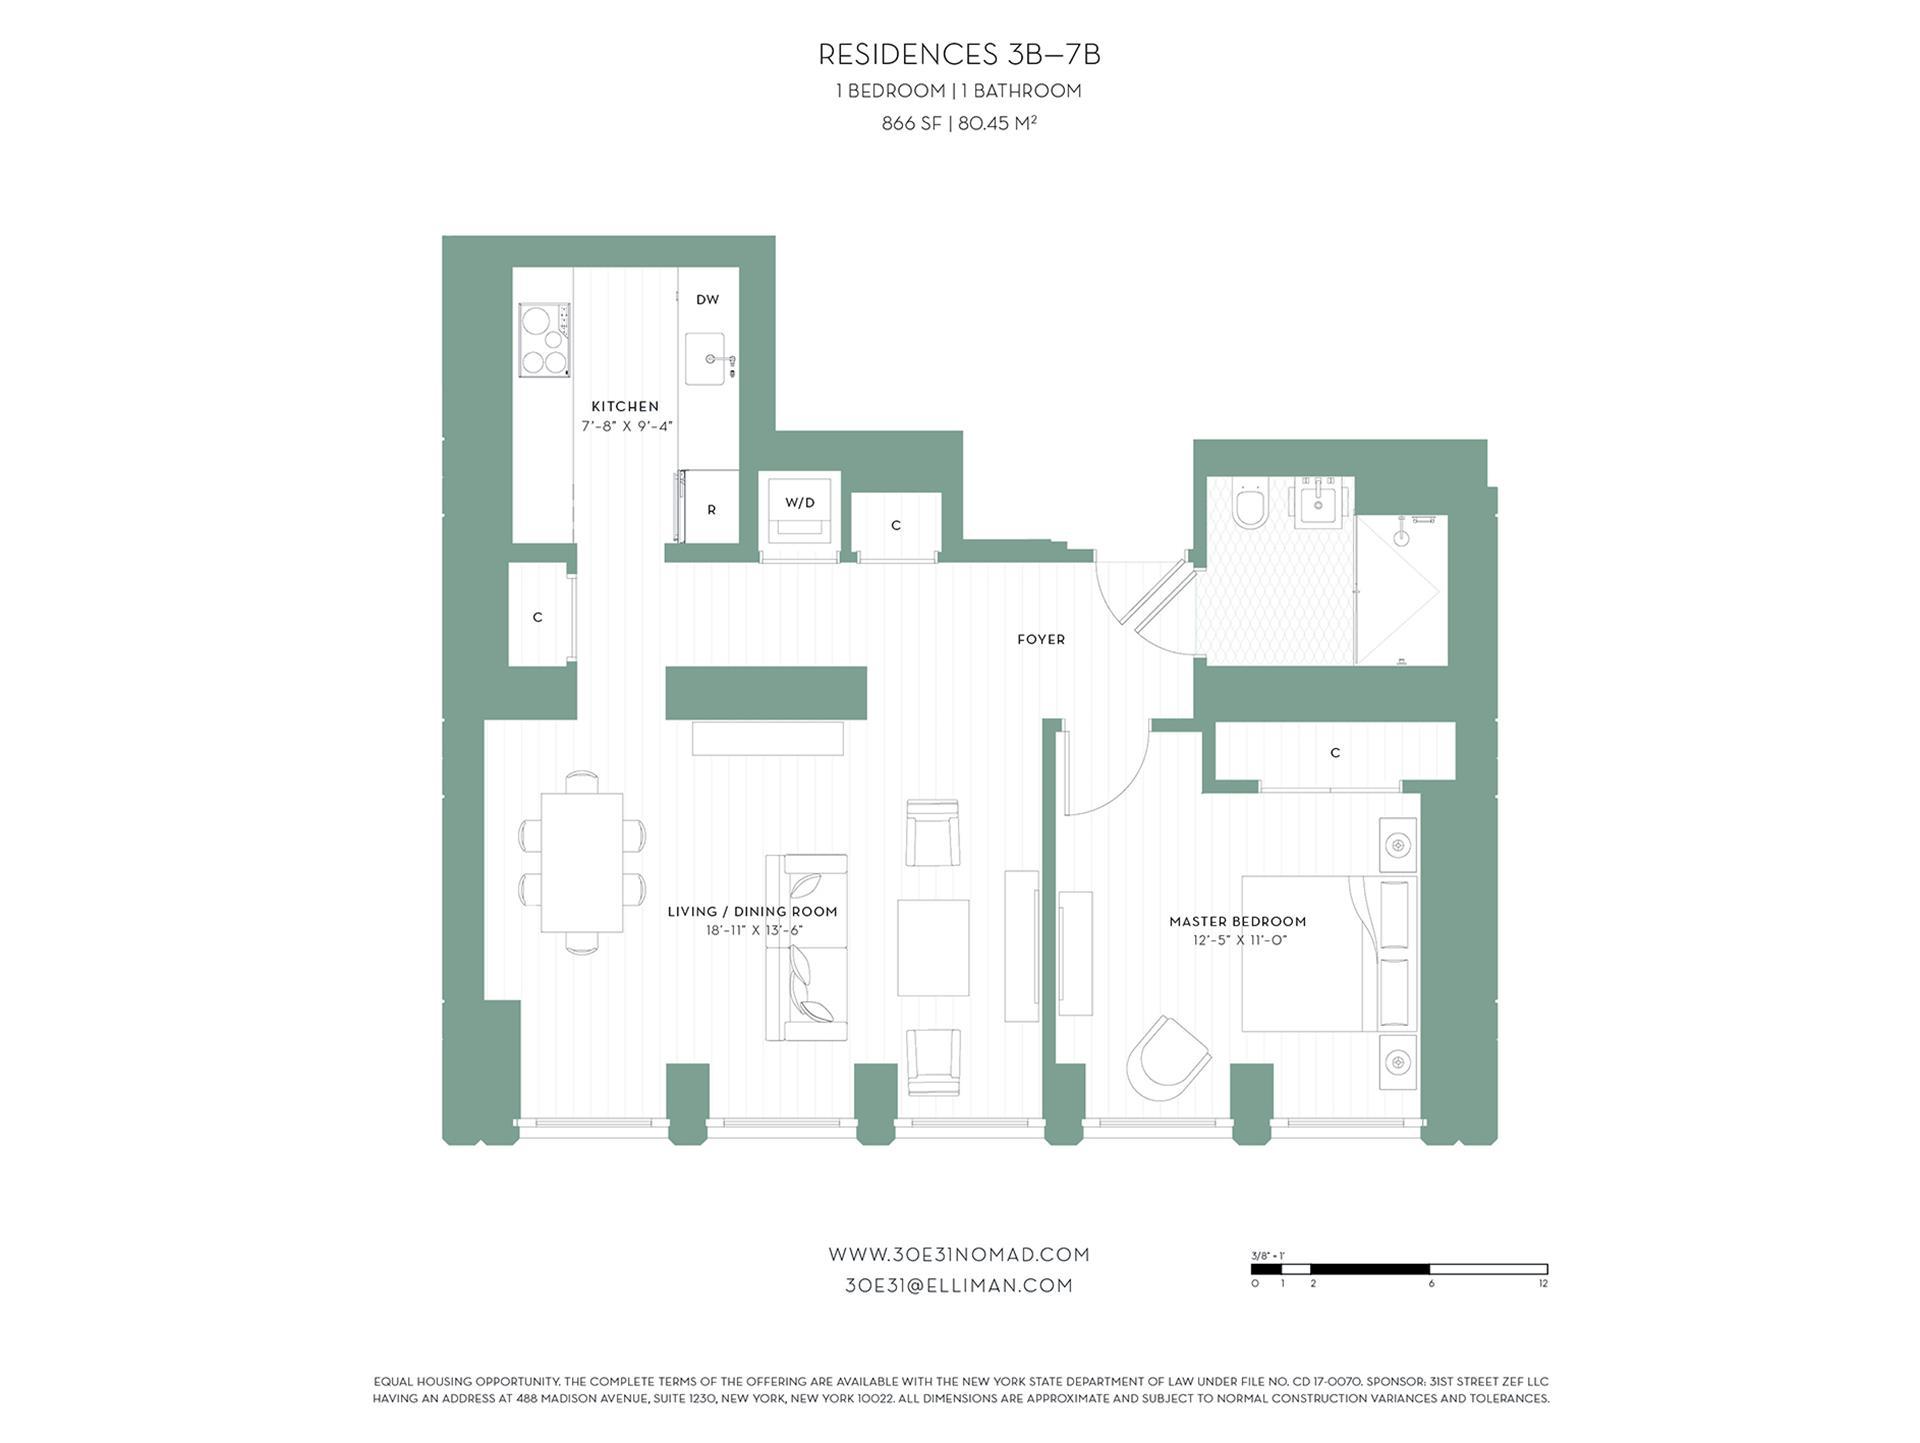 Floor plan of 30 East 31st St, 5B - Midtown, New York